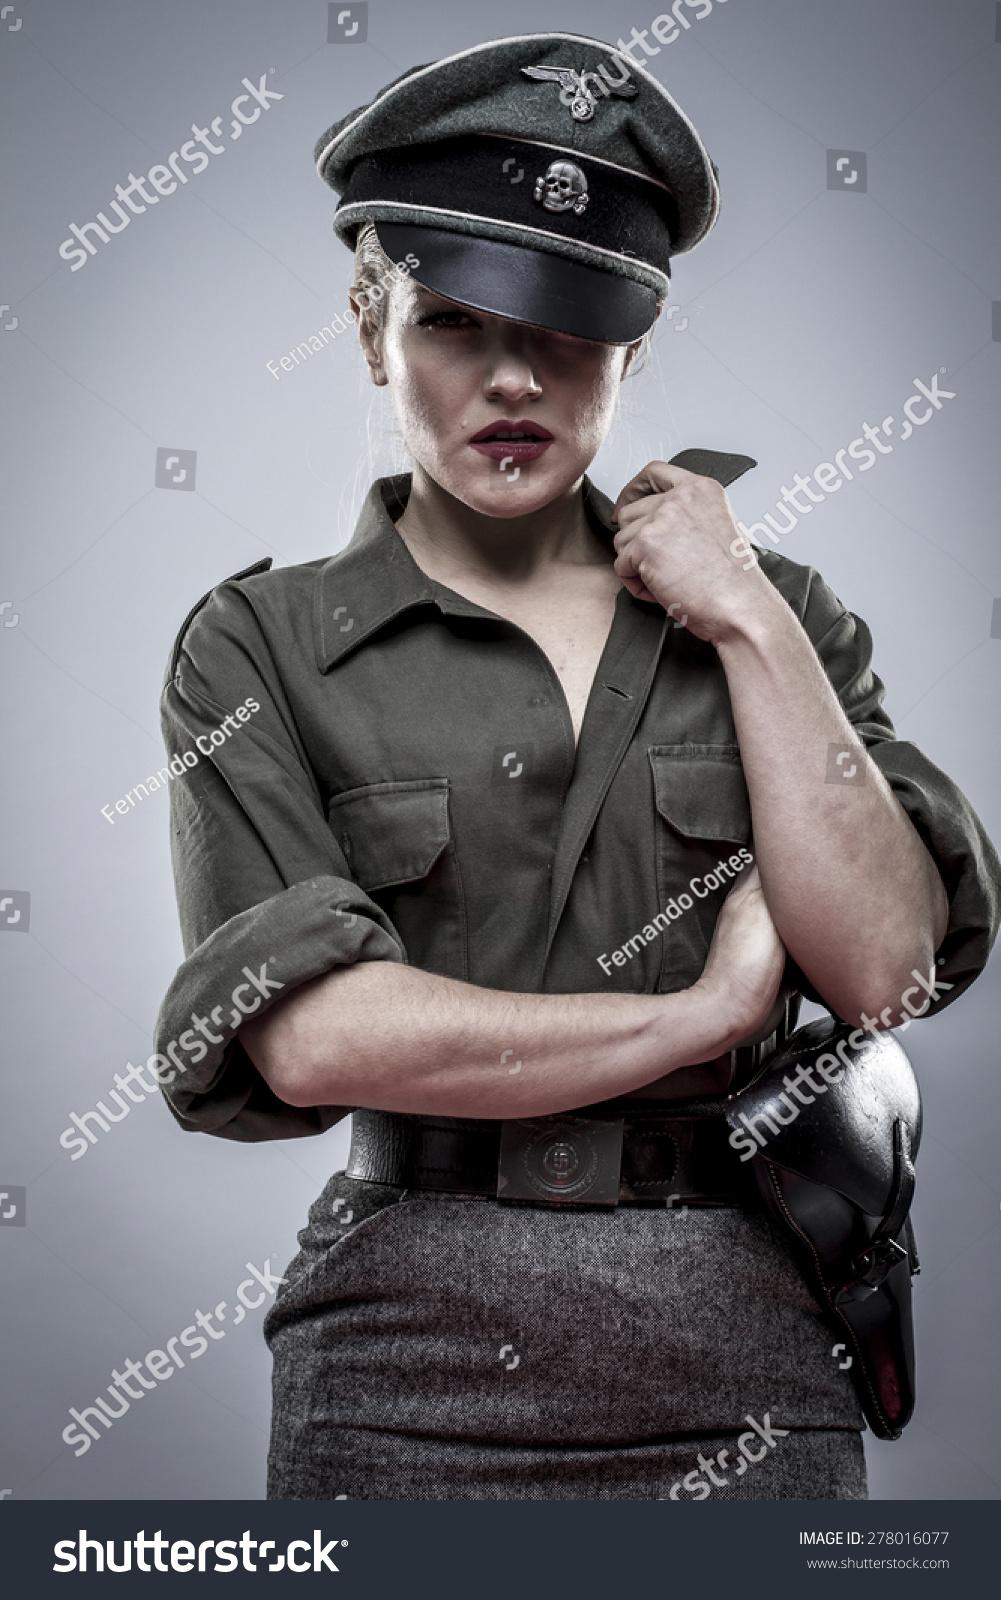 Join told Sexy nazi women uniforms